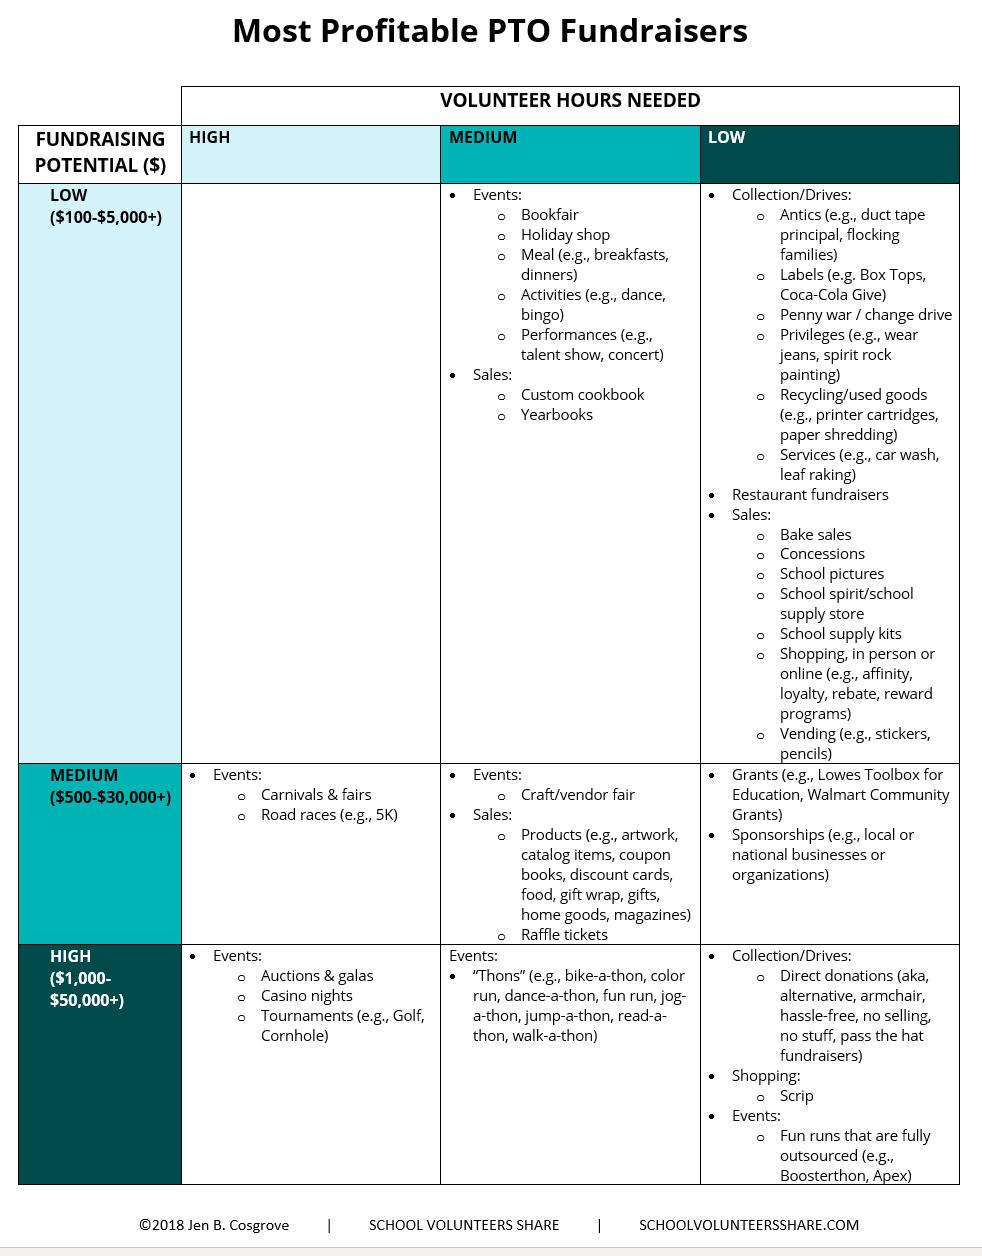 Most profitable PTO fundraisers comparison list